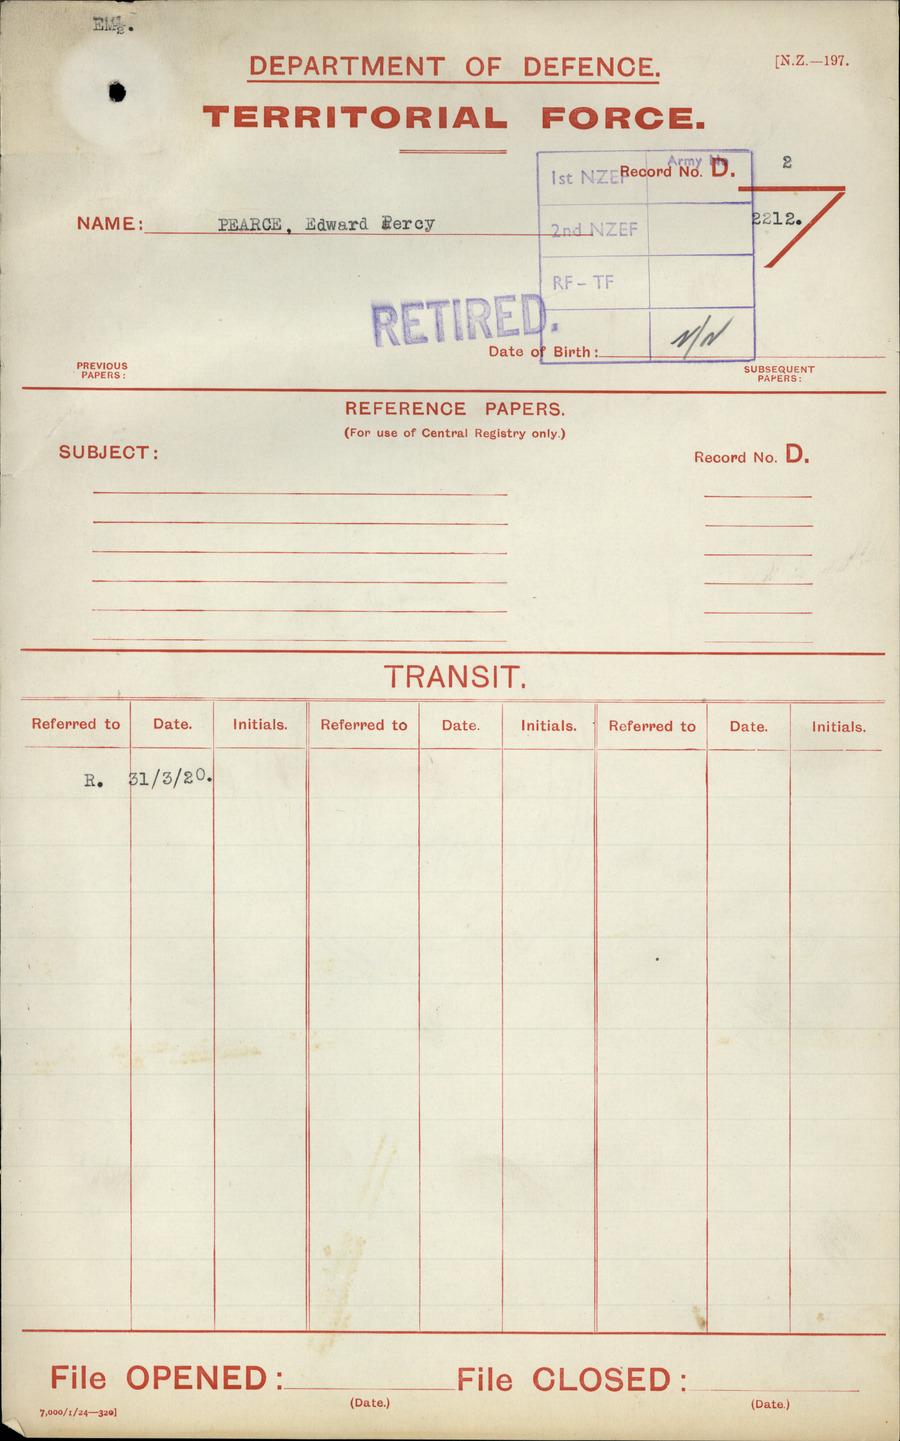 PEARCE, Edward Percy - WW1 N/N - Army [Original Paper Personnel File]